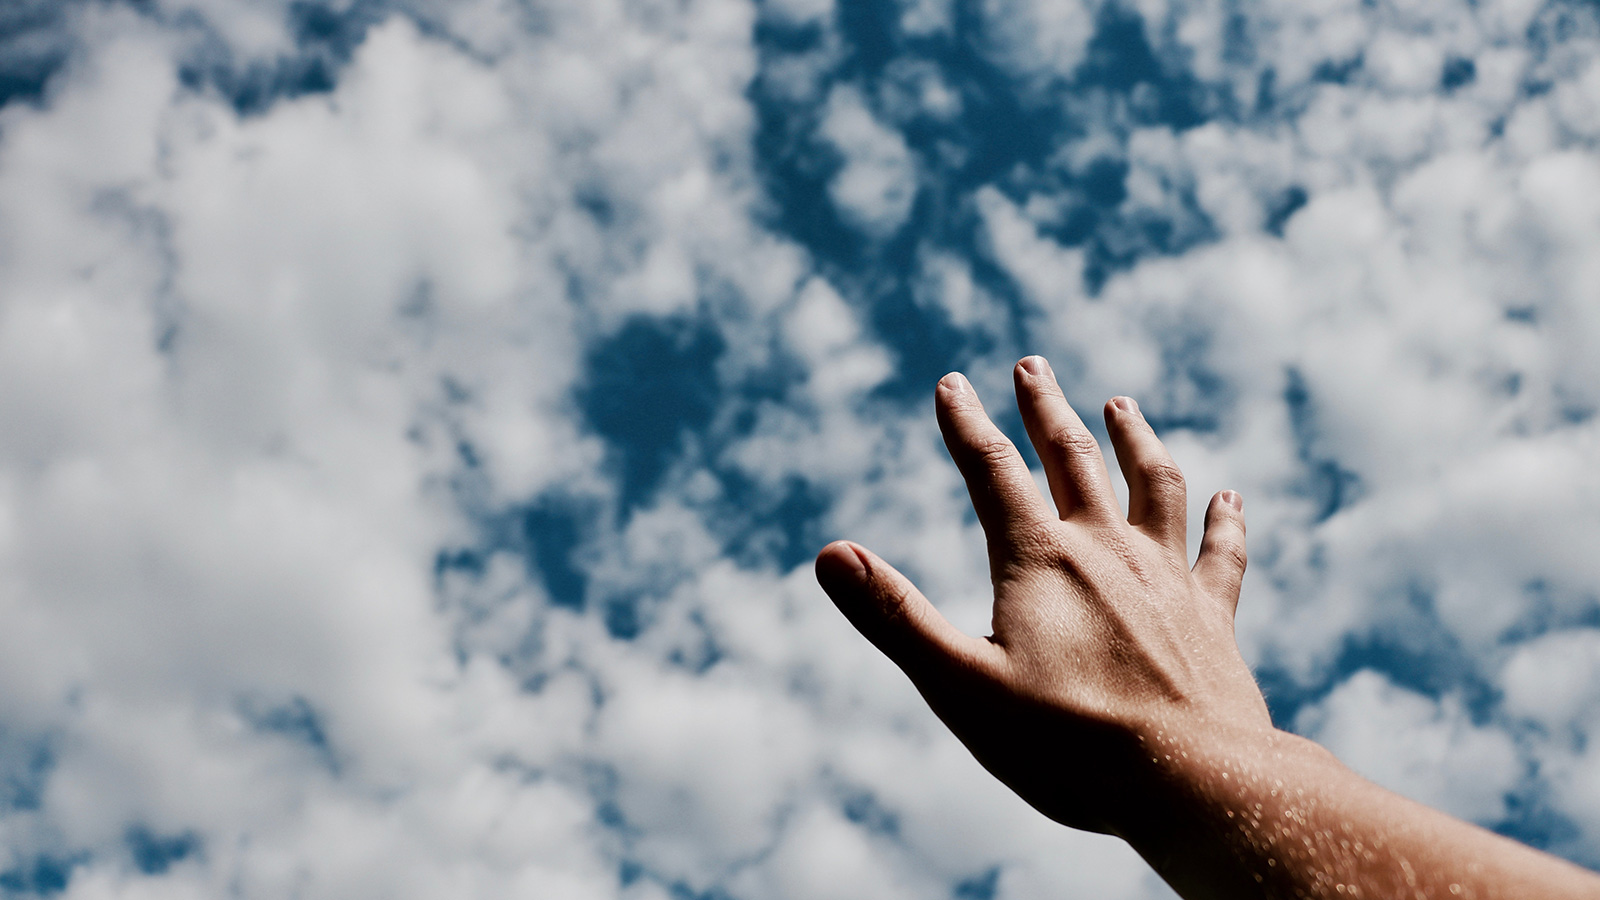 CAN YOUR FAITH CARRY THE PROMISES OF GOD?